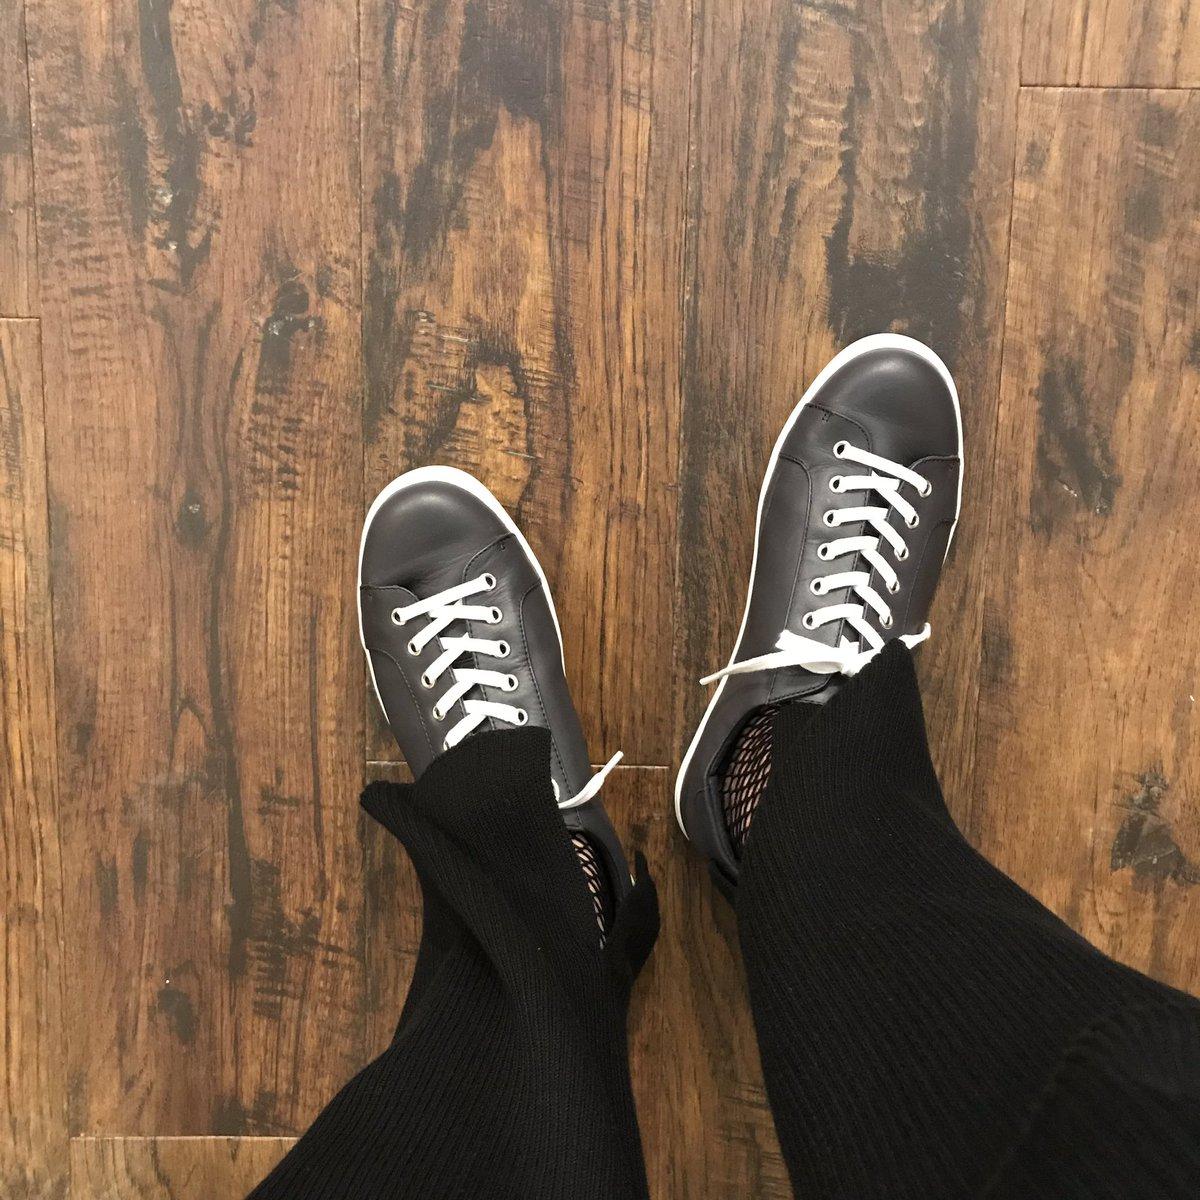 【MARGARET HOWELL idea】 size 24cm  #margarethowellidea  #shoes  #レザースニーカー #古着屋pic.twitter.com/XU4oE2gBQK